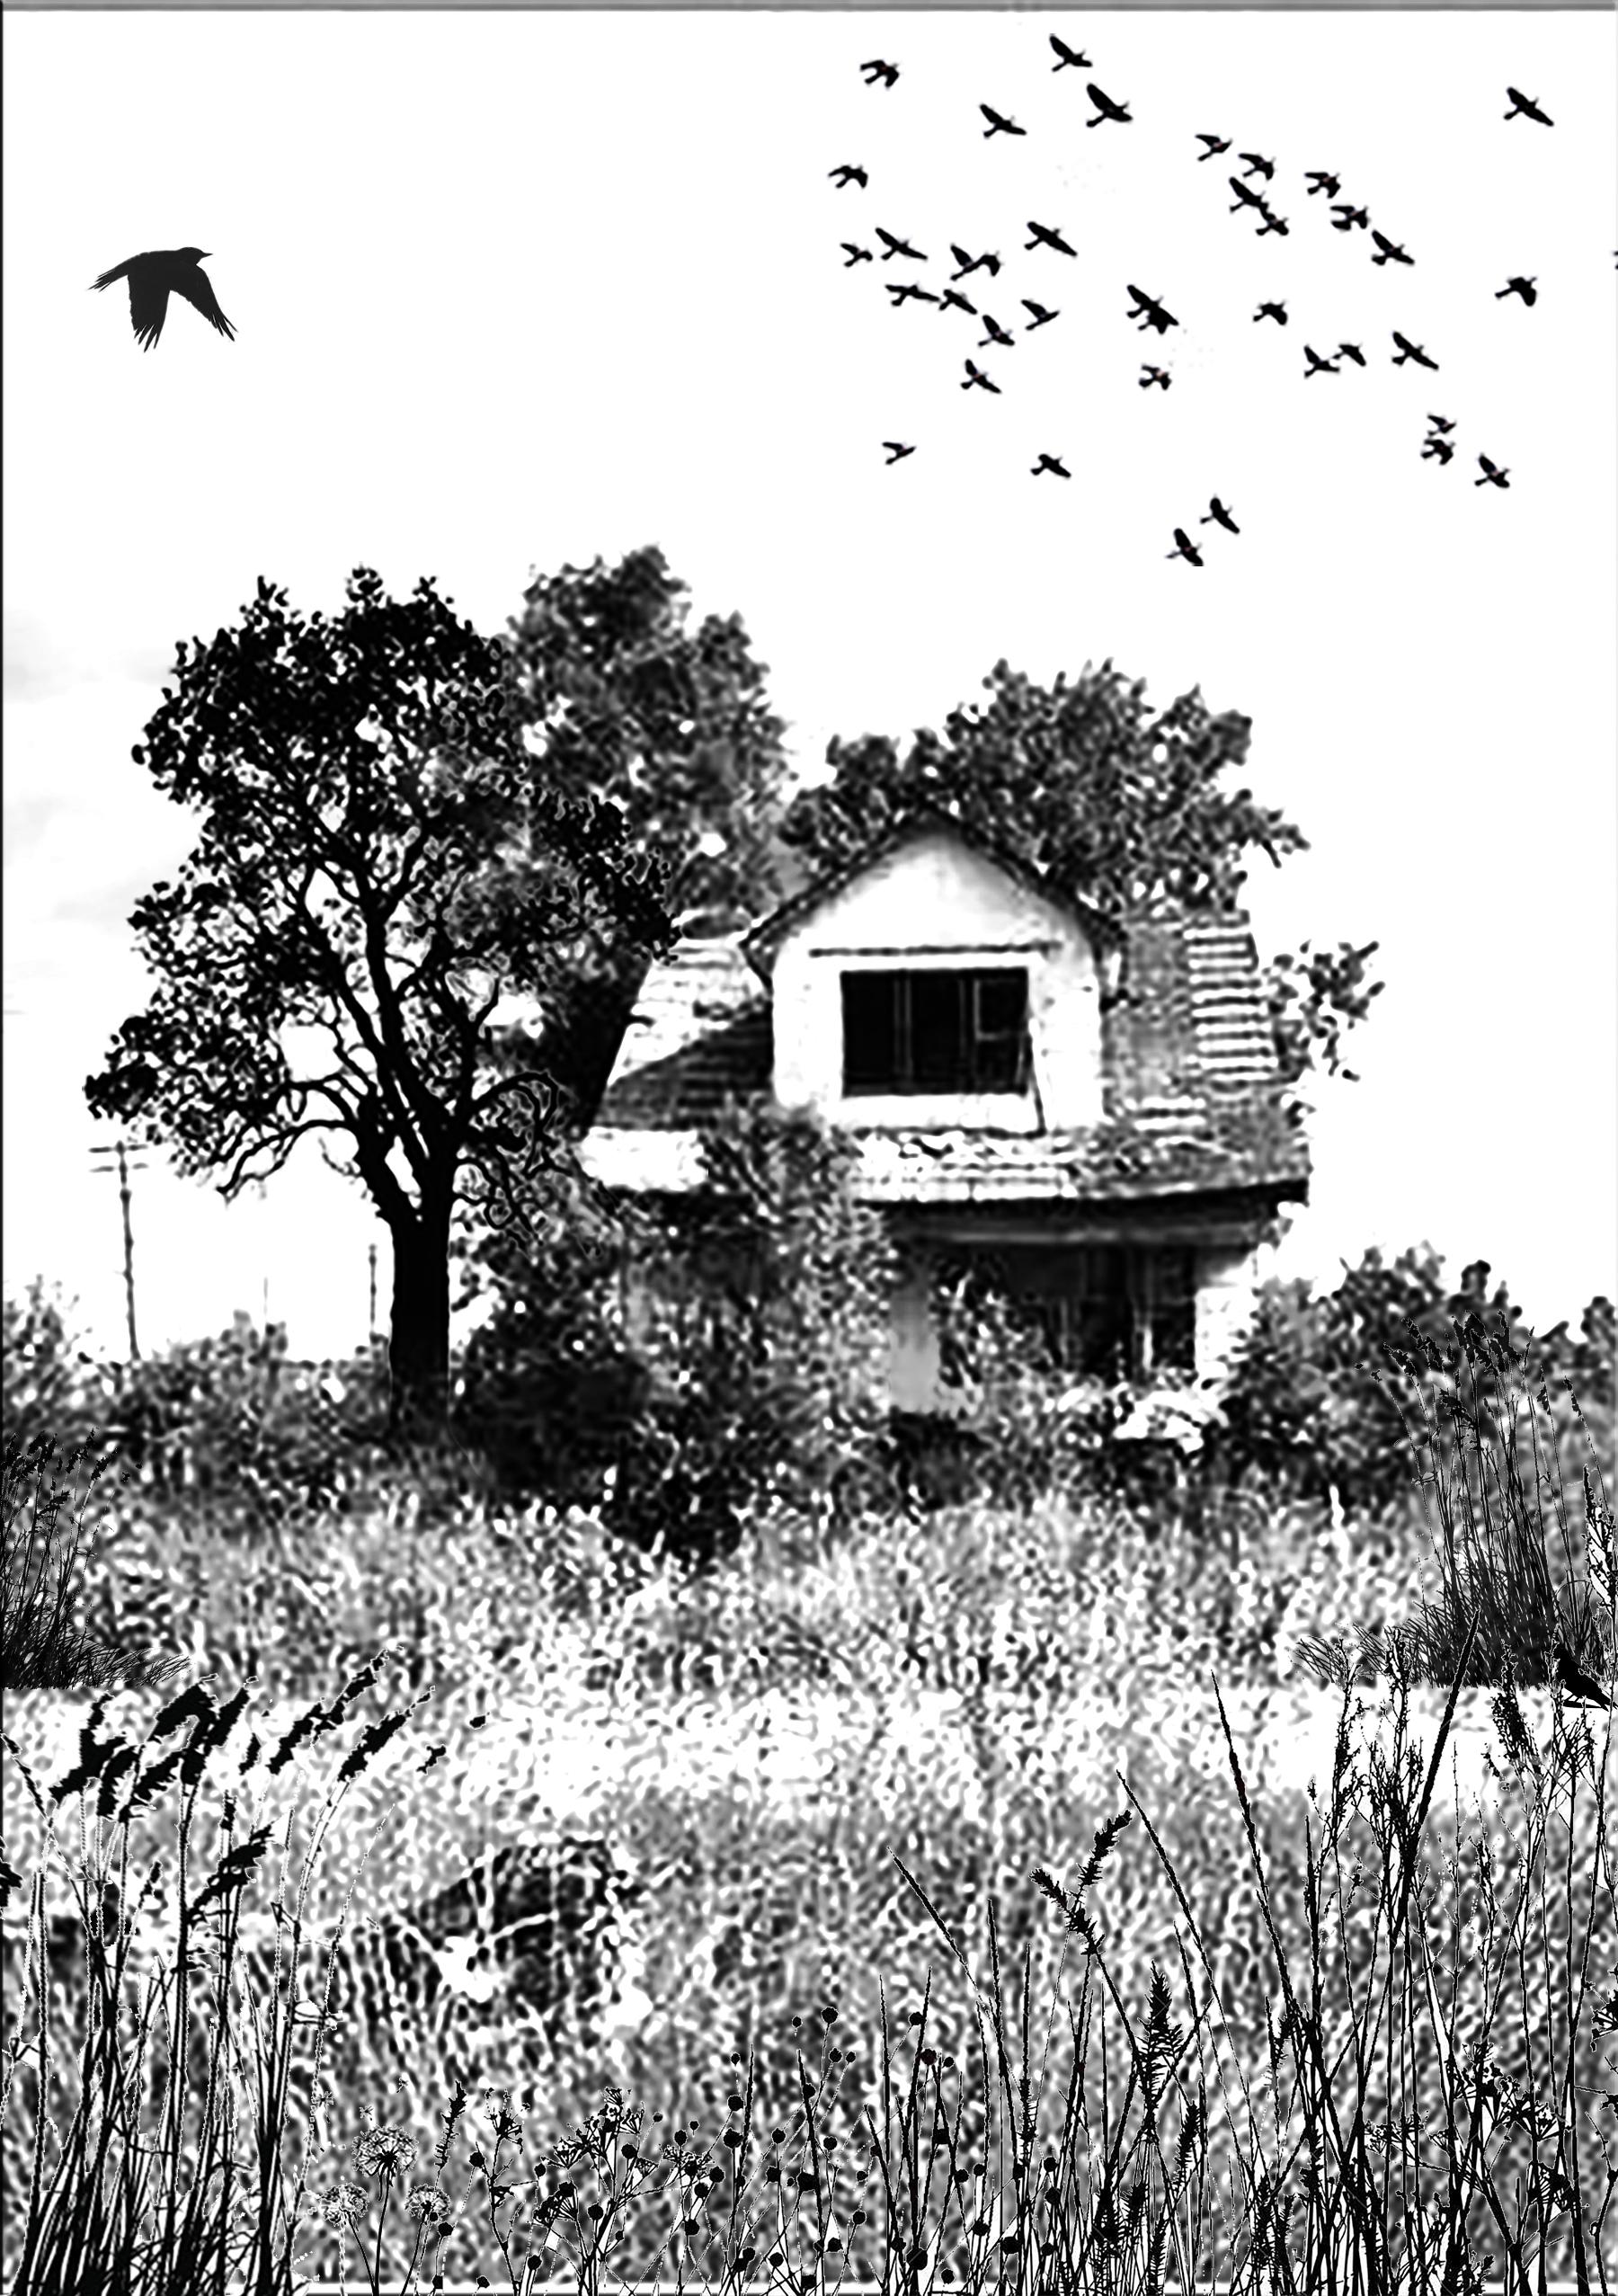 DetroitHouse-3-4-3.jpg